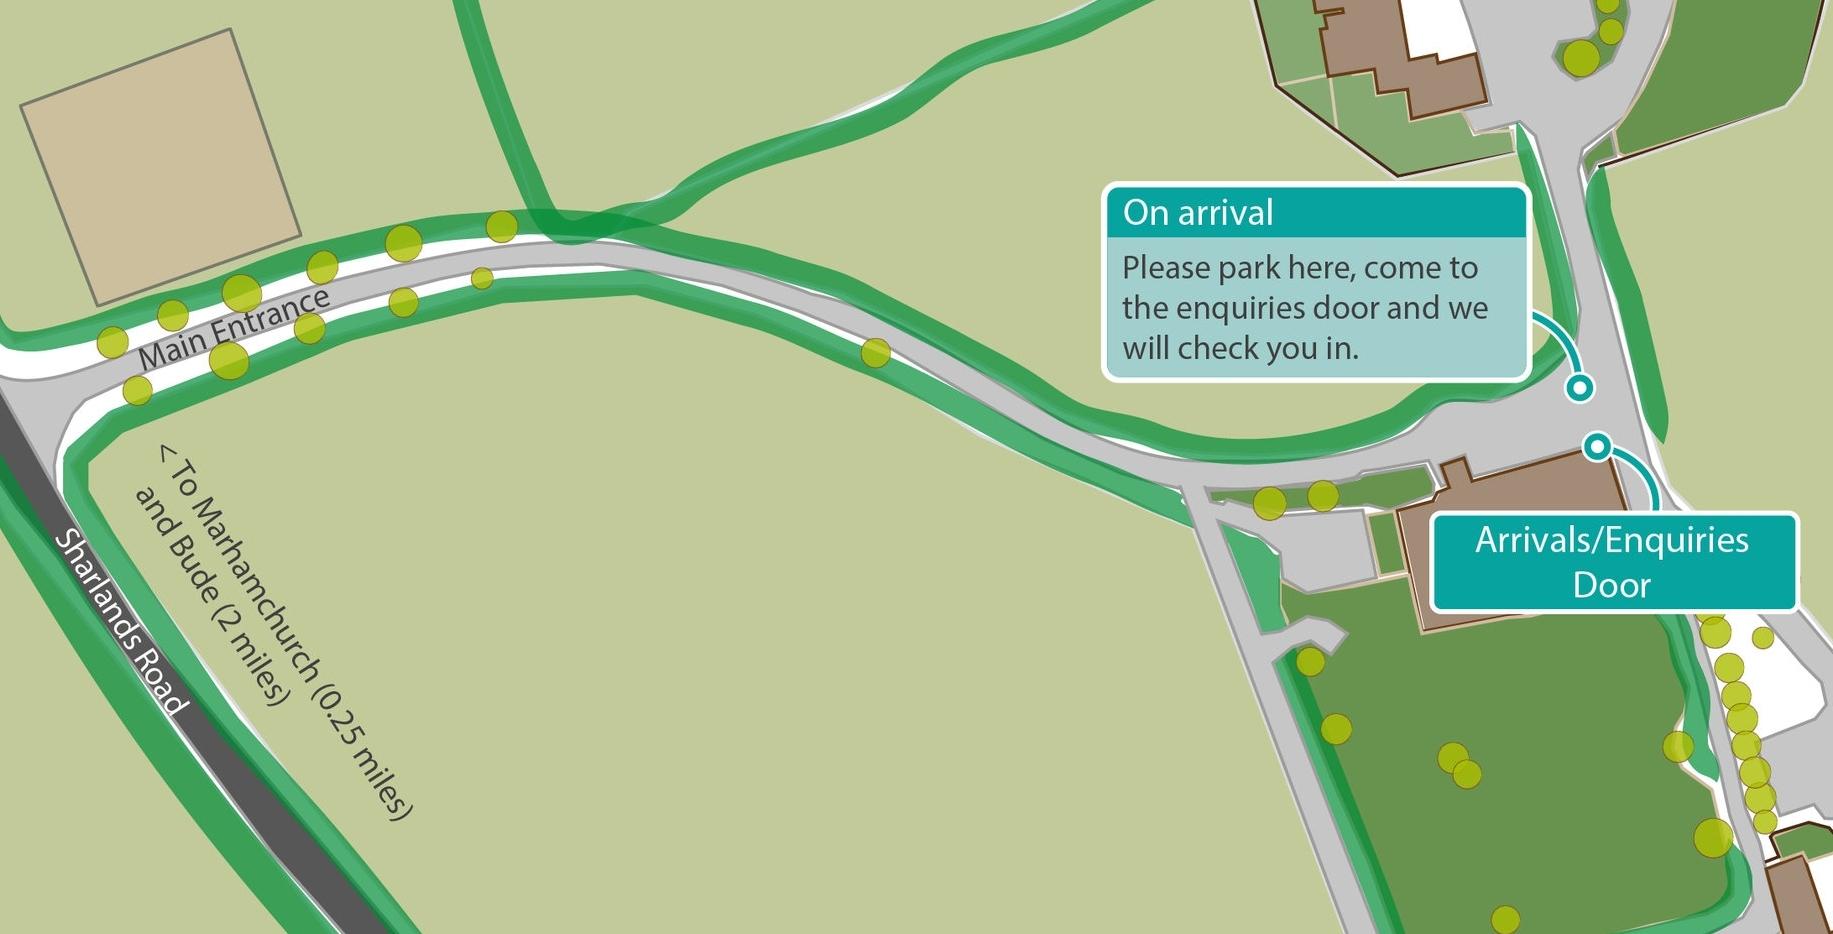 wooldown-site-layout-map-ARRIVALS.jpg